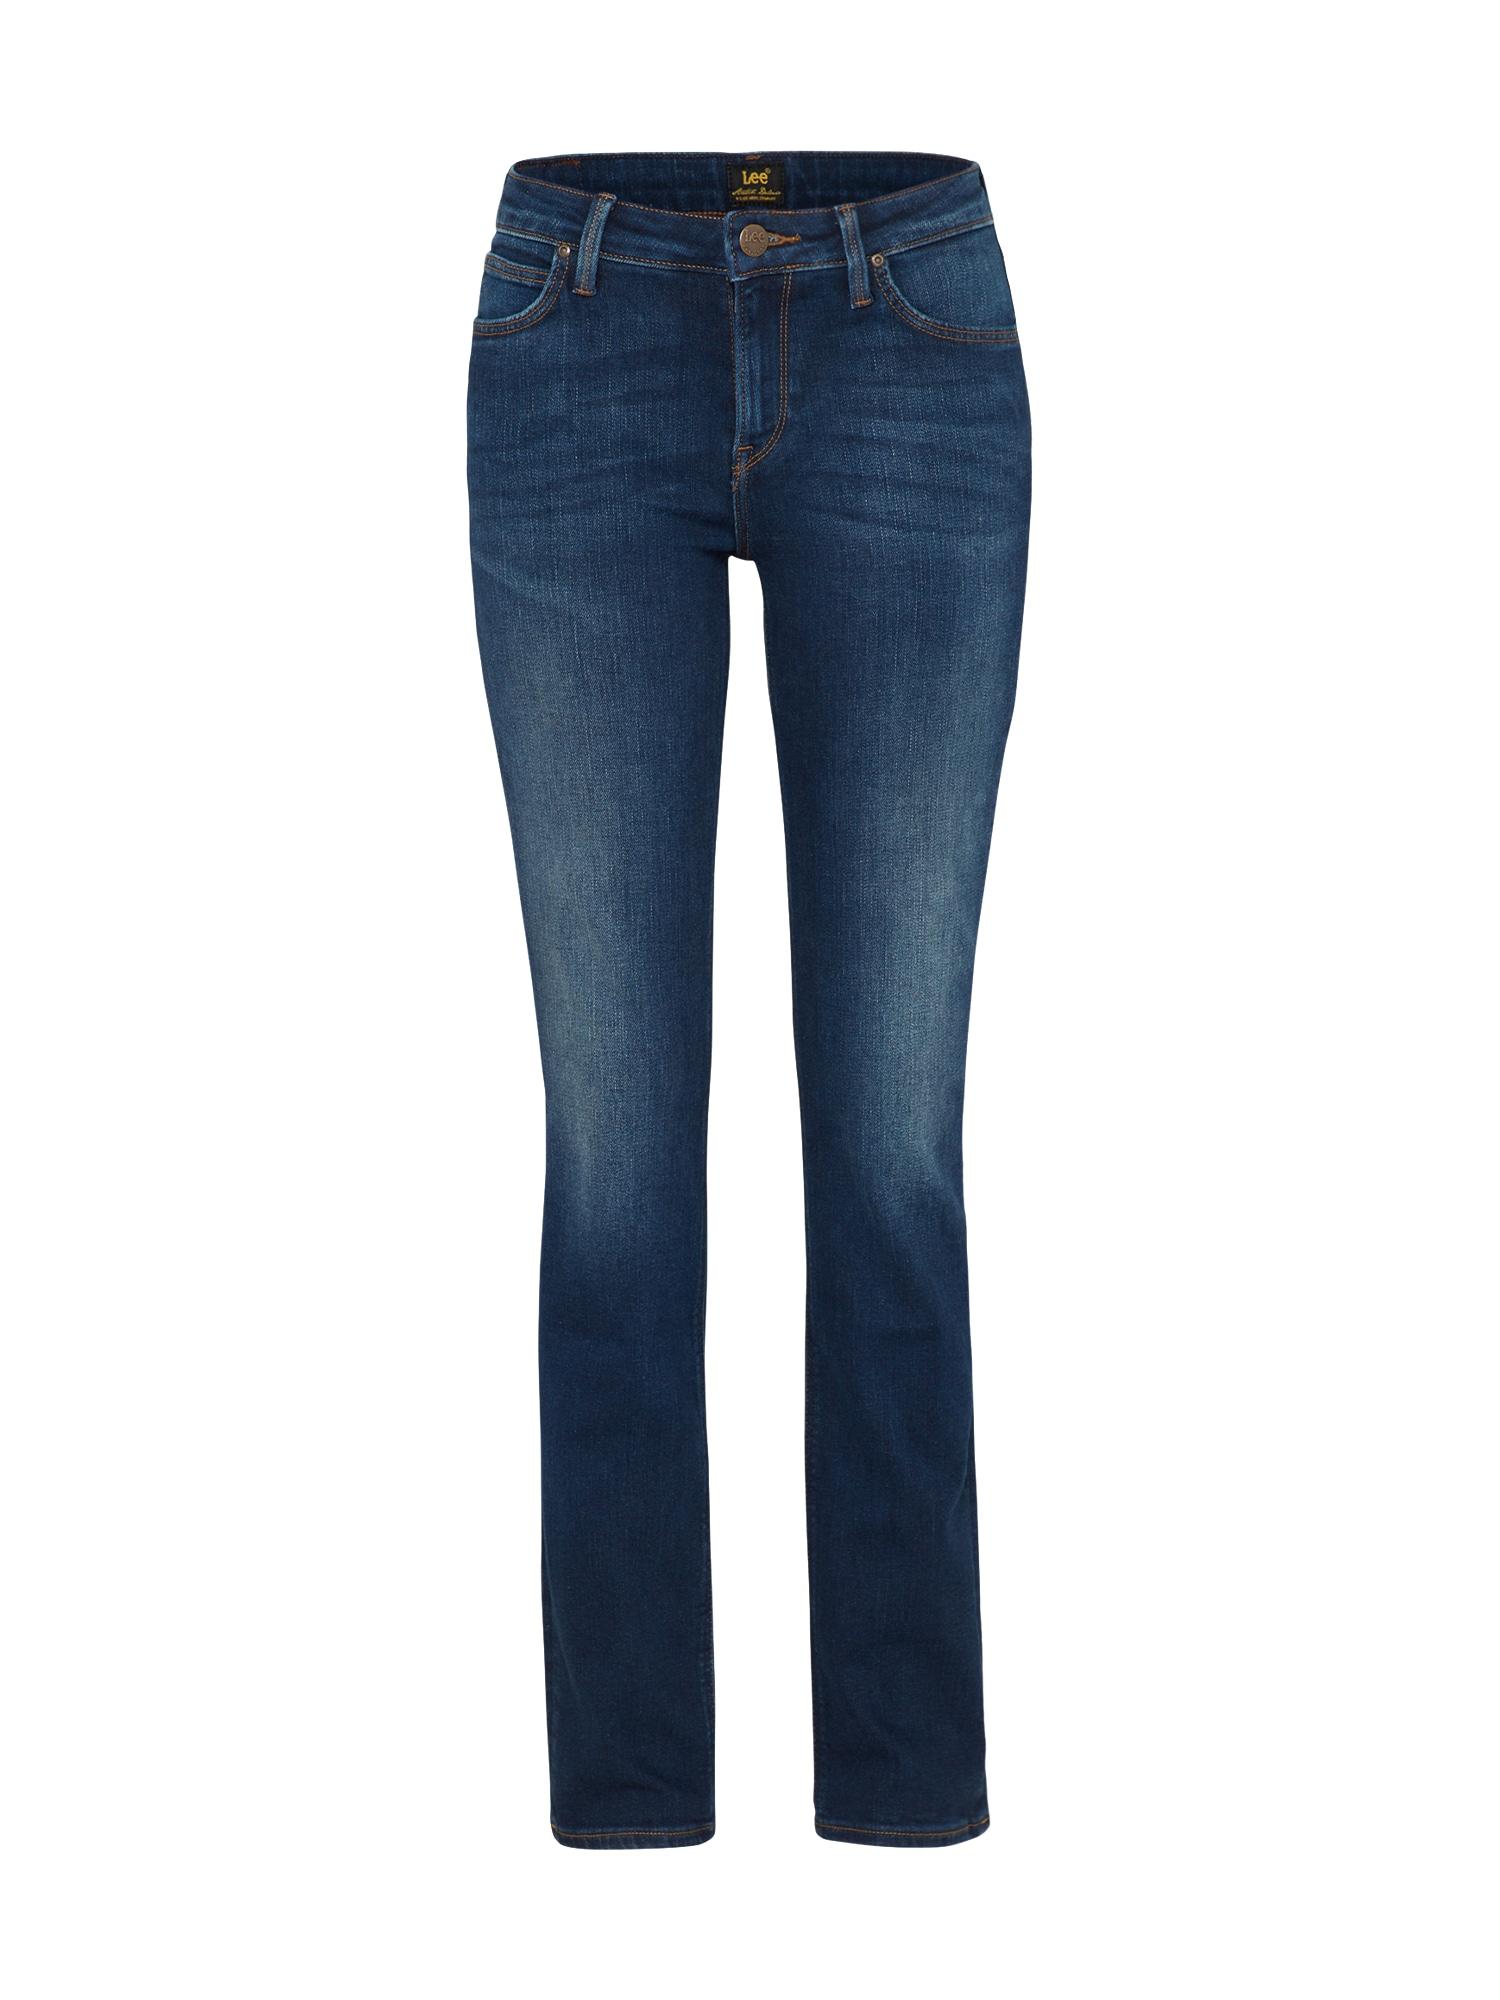 Lee Dames Jeans Marion Straight blue denim